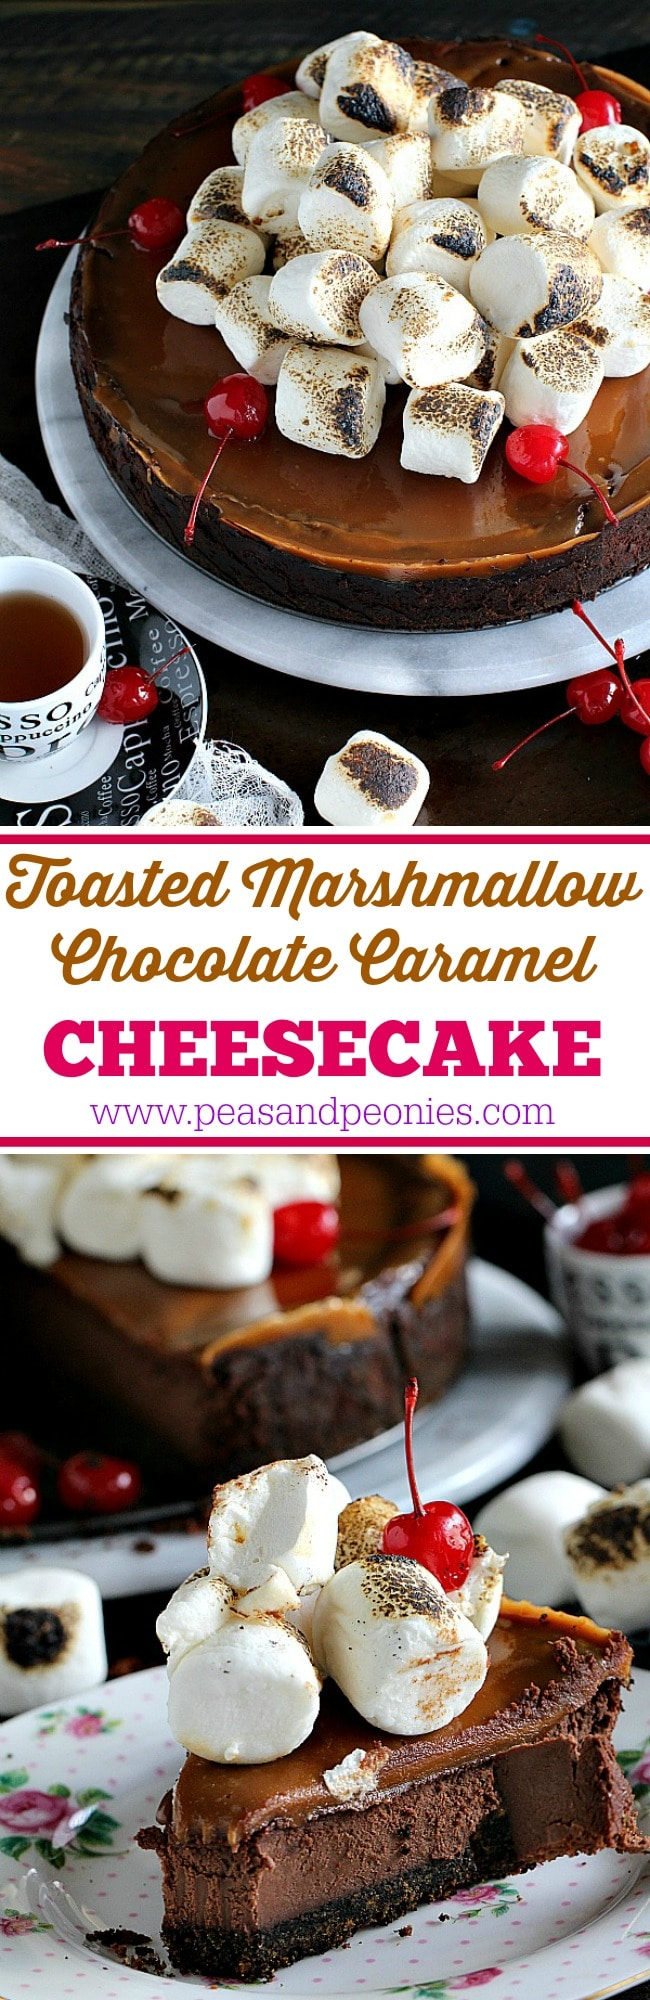 toasted marshmallow chocolate caramel cheesecake 6001